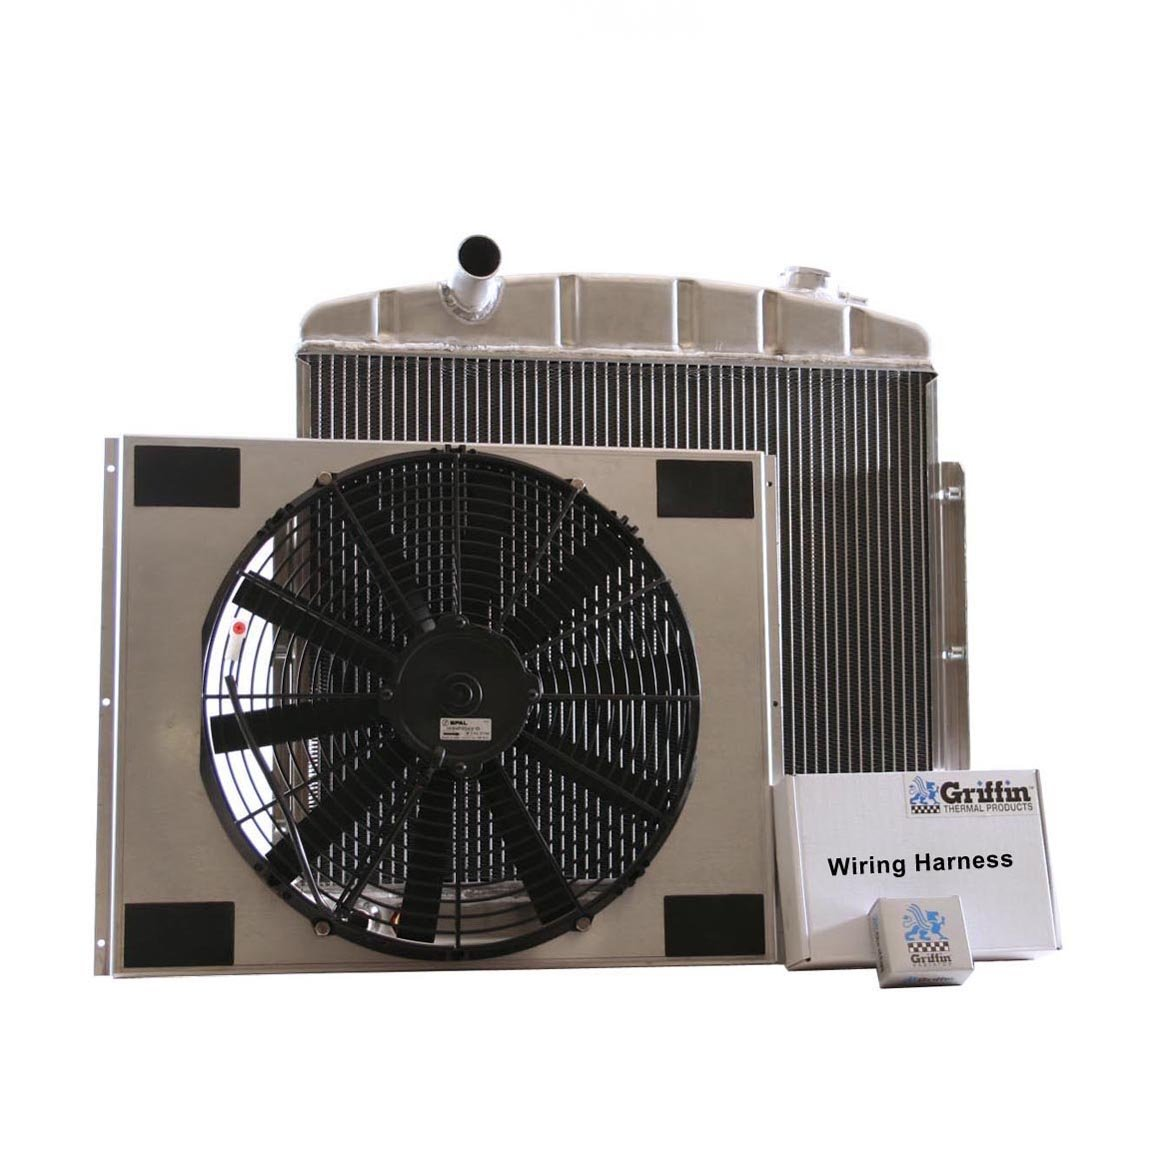 Griffin Radiator CU-70065 ComboUnit Radiator and Electric Fan Kit